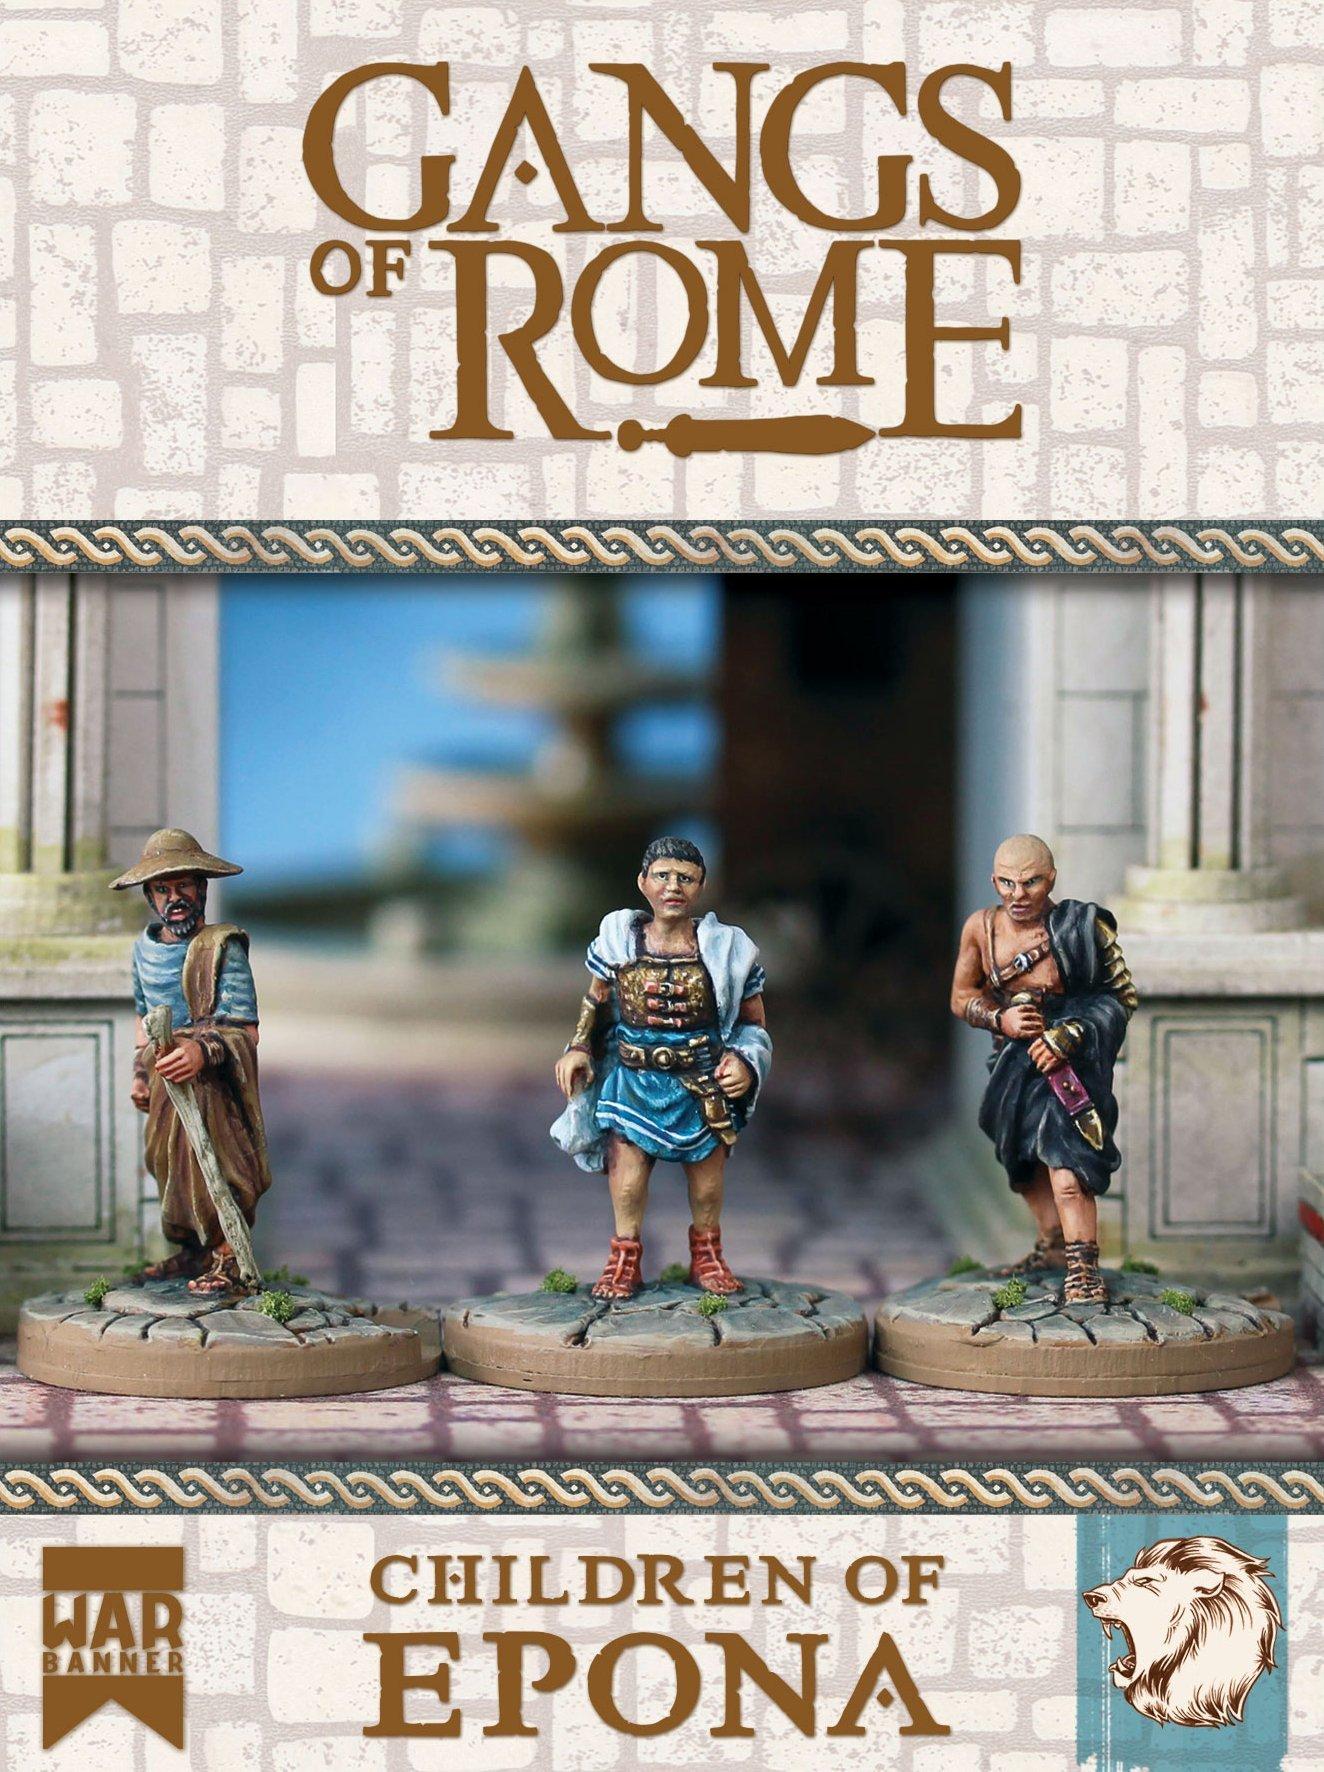 Children of Epona, Gangs of Rome